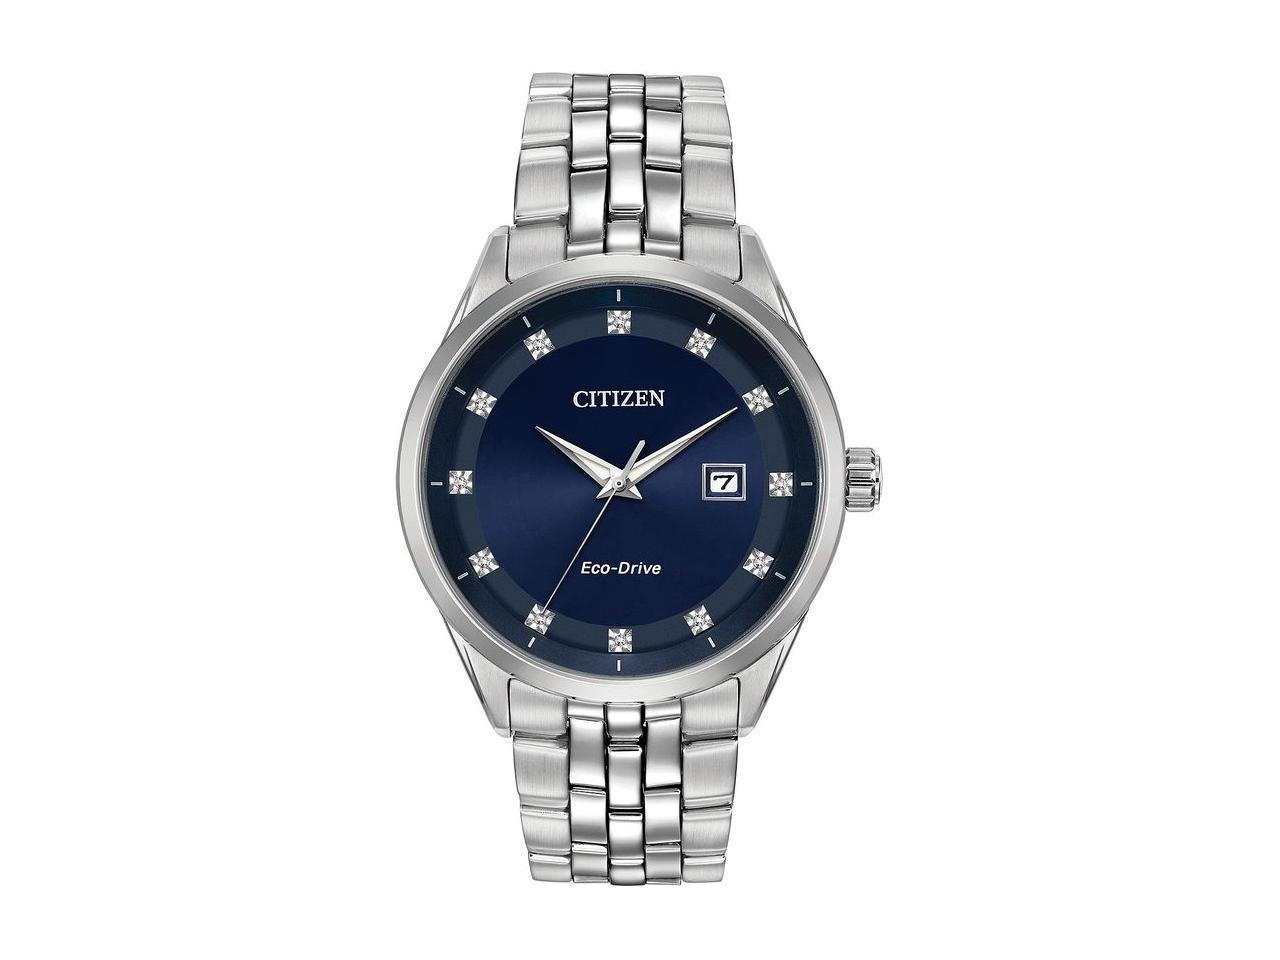 Citizen Men's Eco-Drive Stainless Steel Watch BM7251-53M